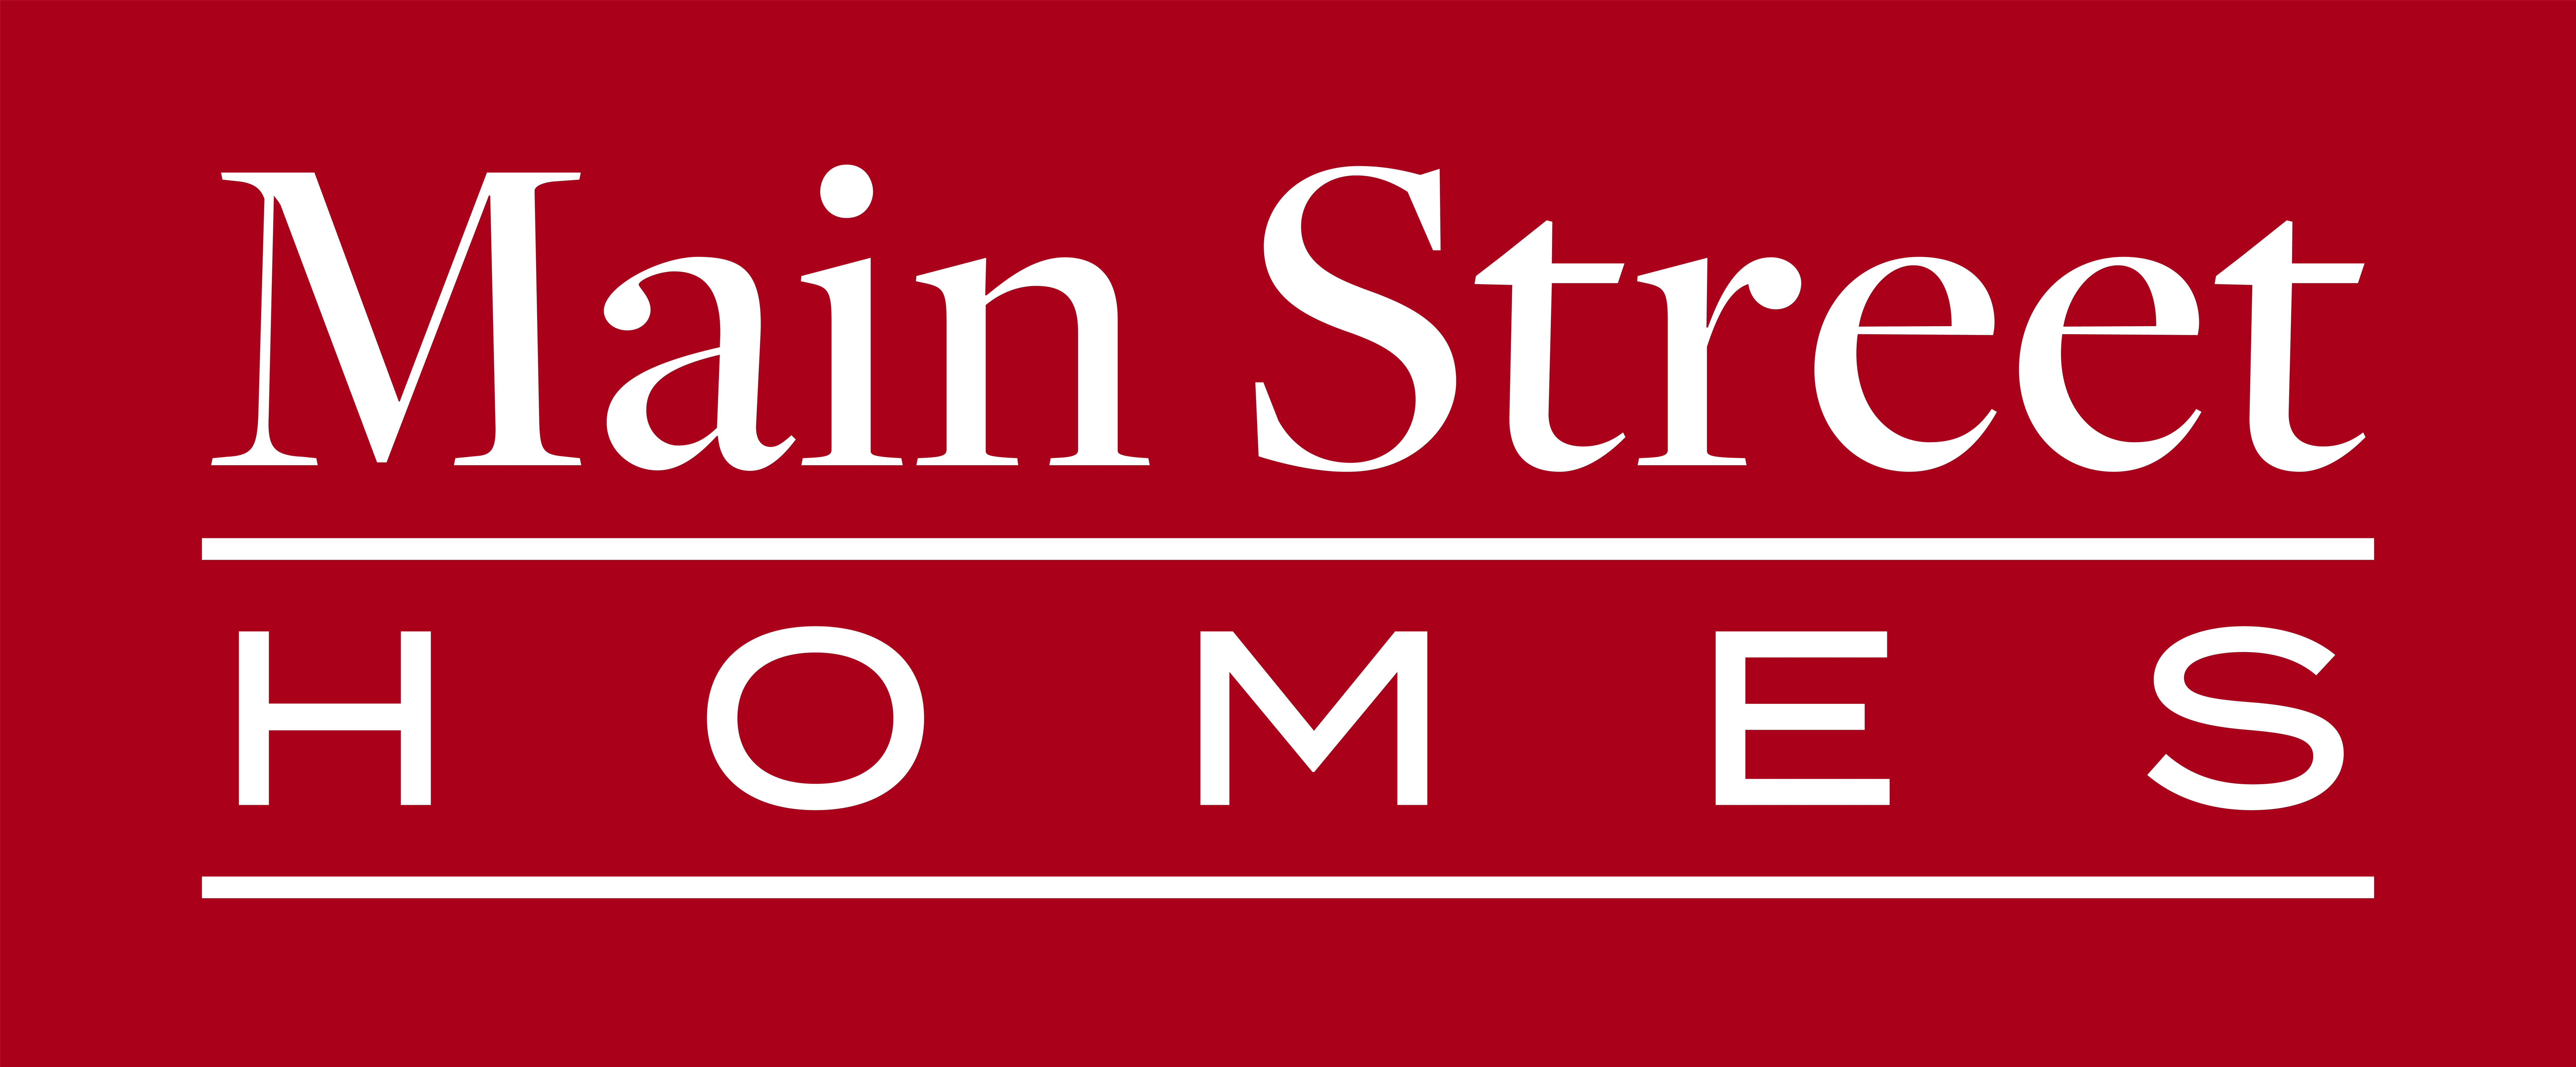 mainstreet-logo-RedBox-2017